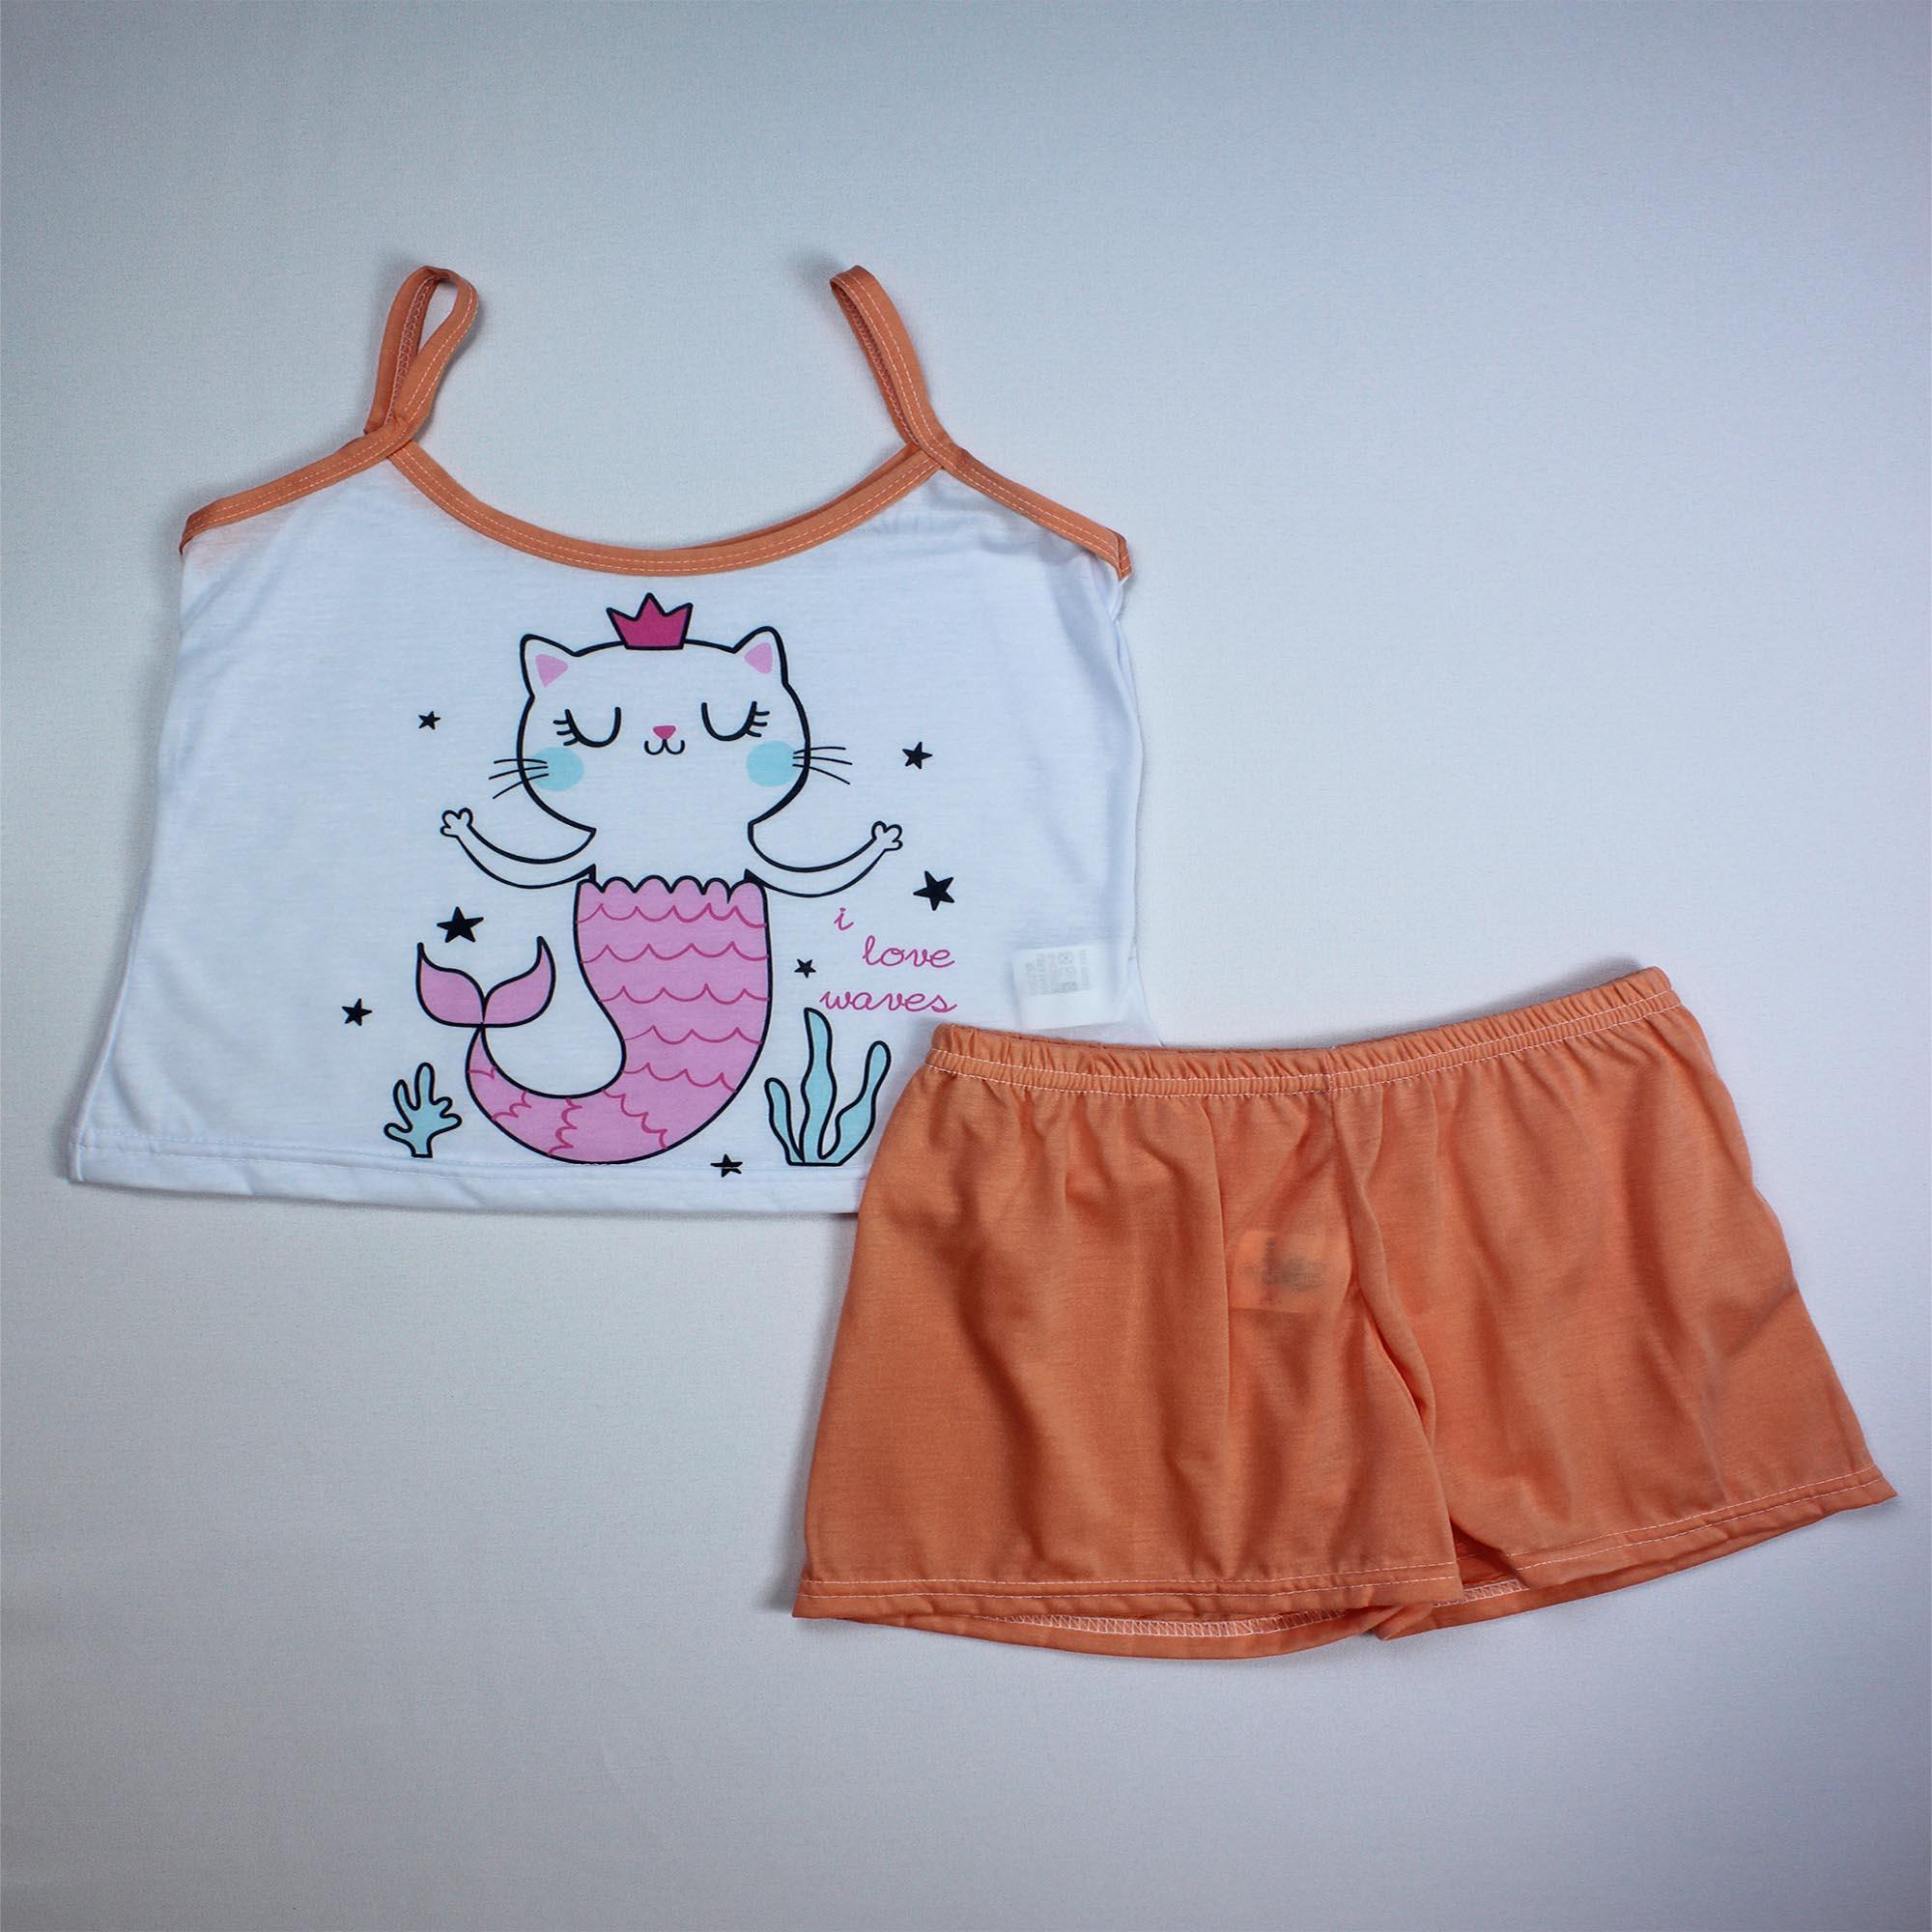 Pijama Regata Infantil Menina - Tamanho 10